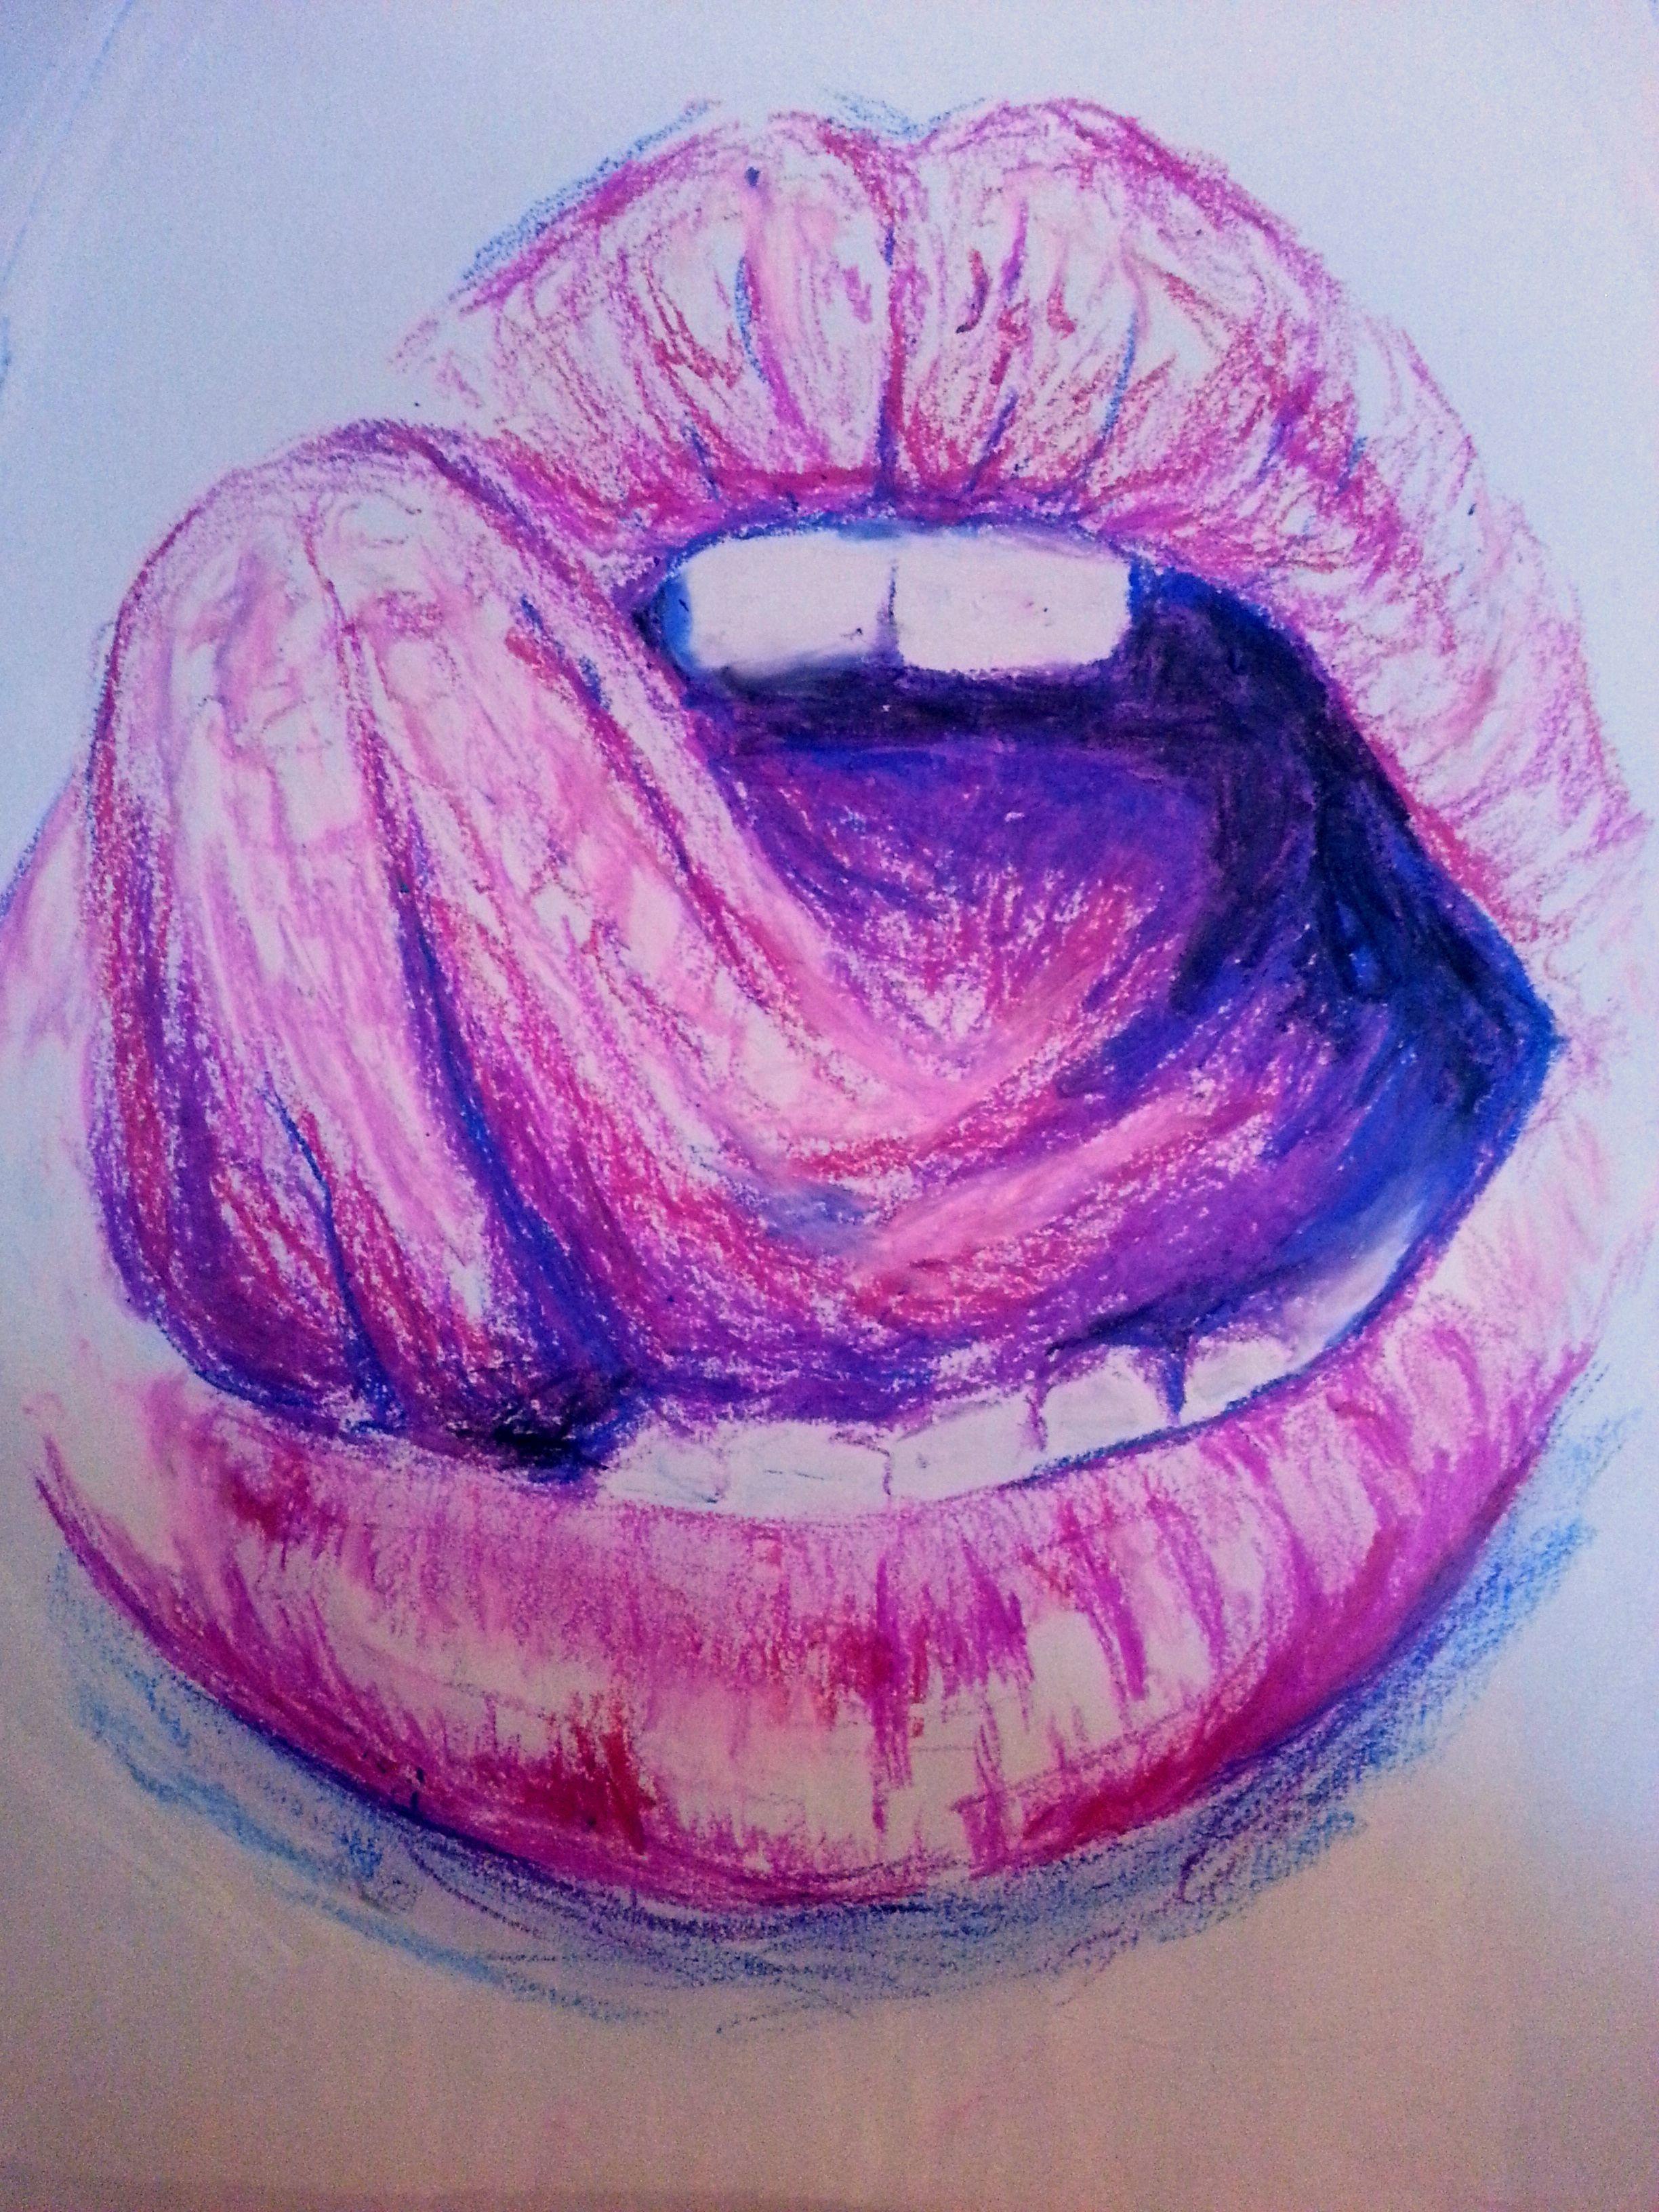 указана рисунок с губами тебя днем